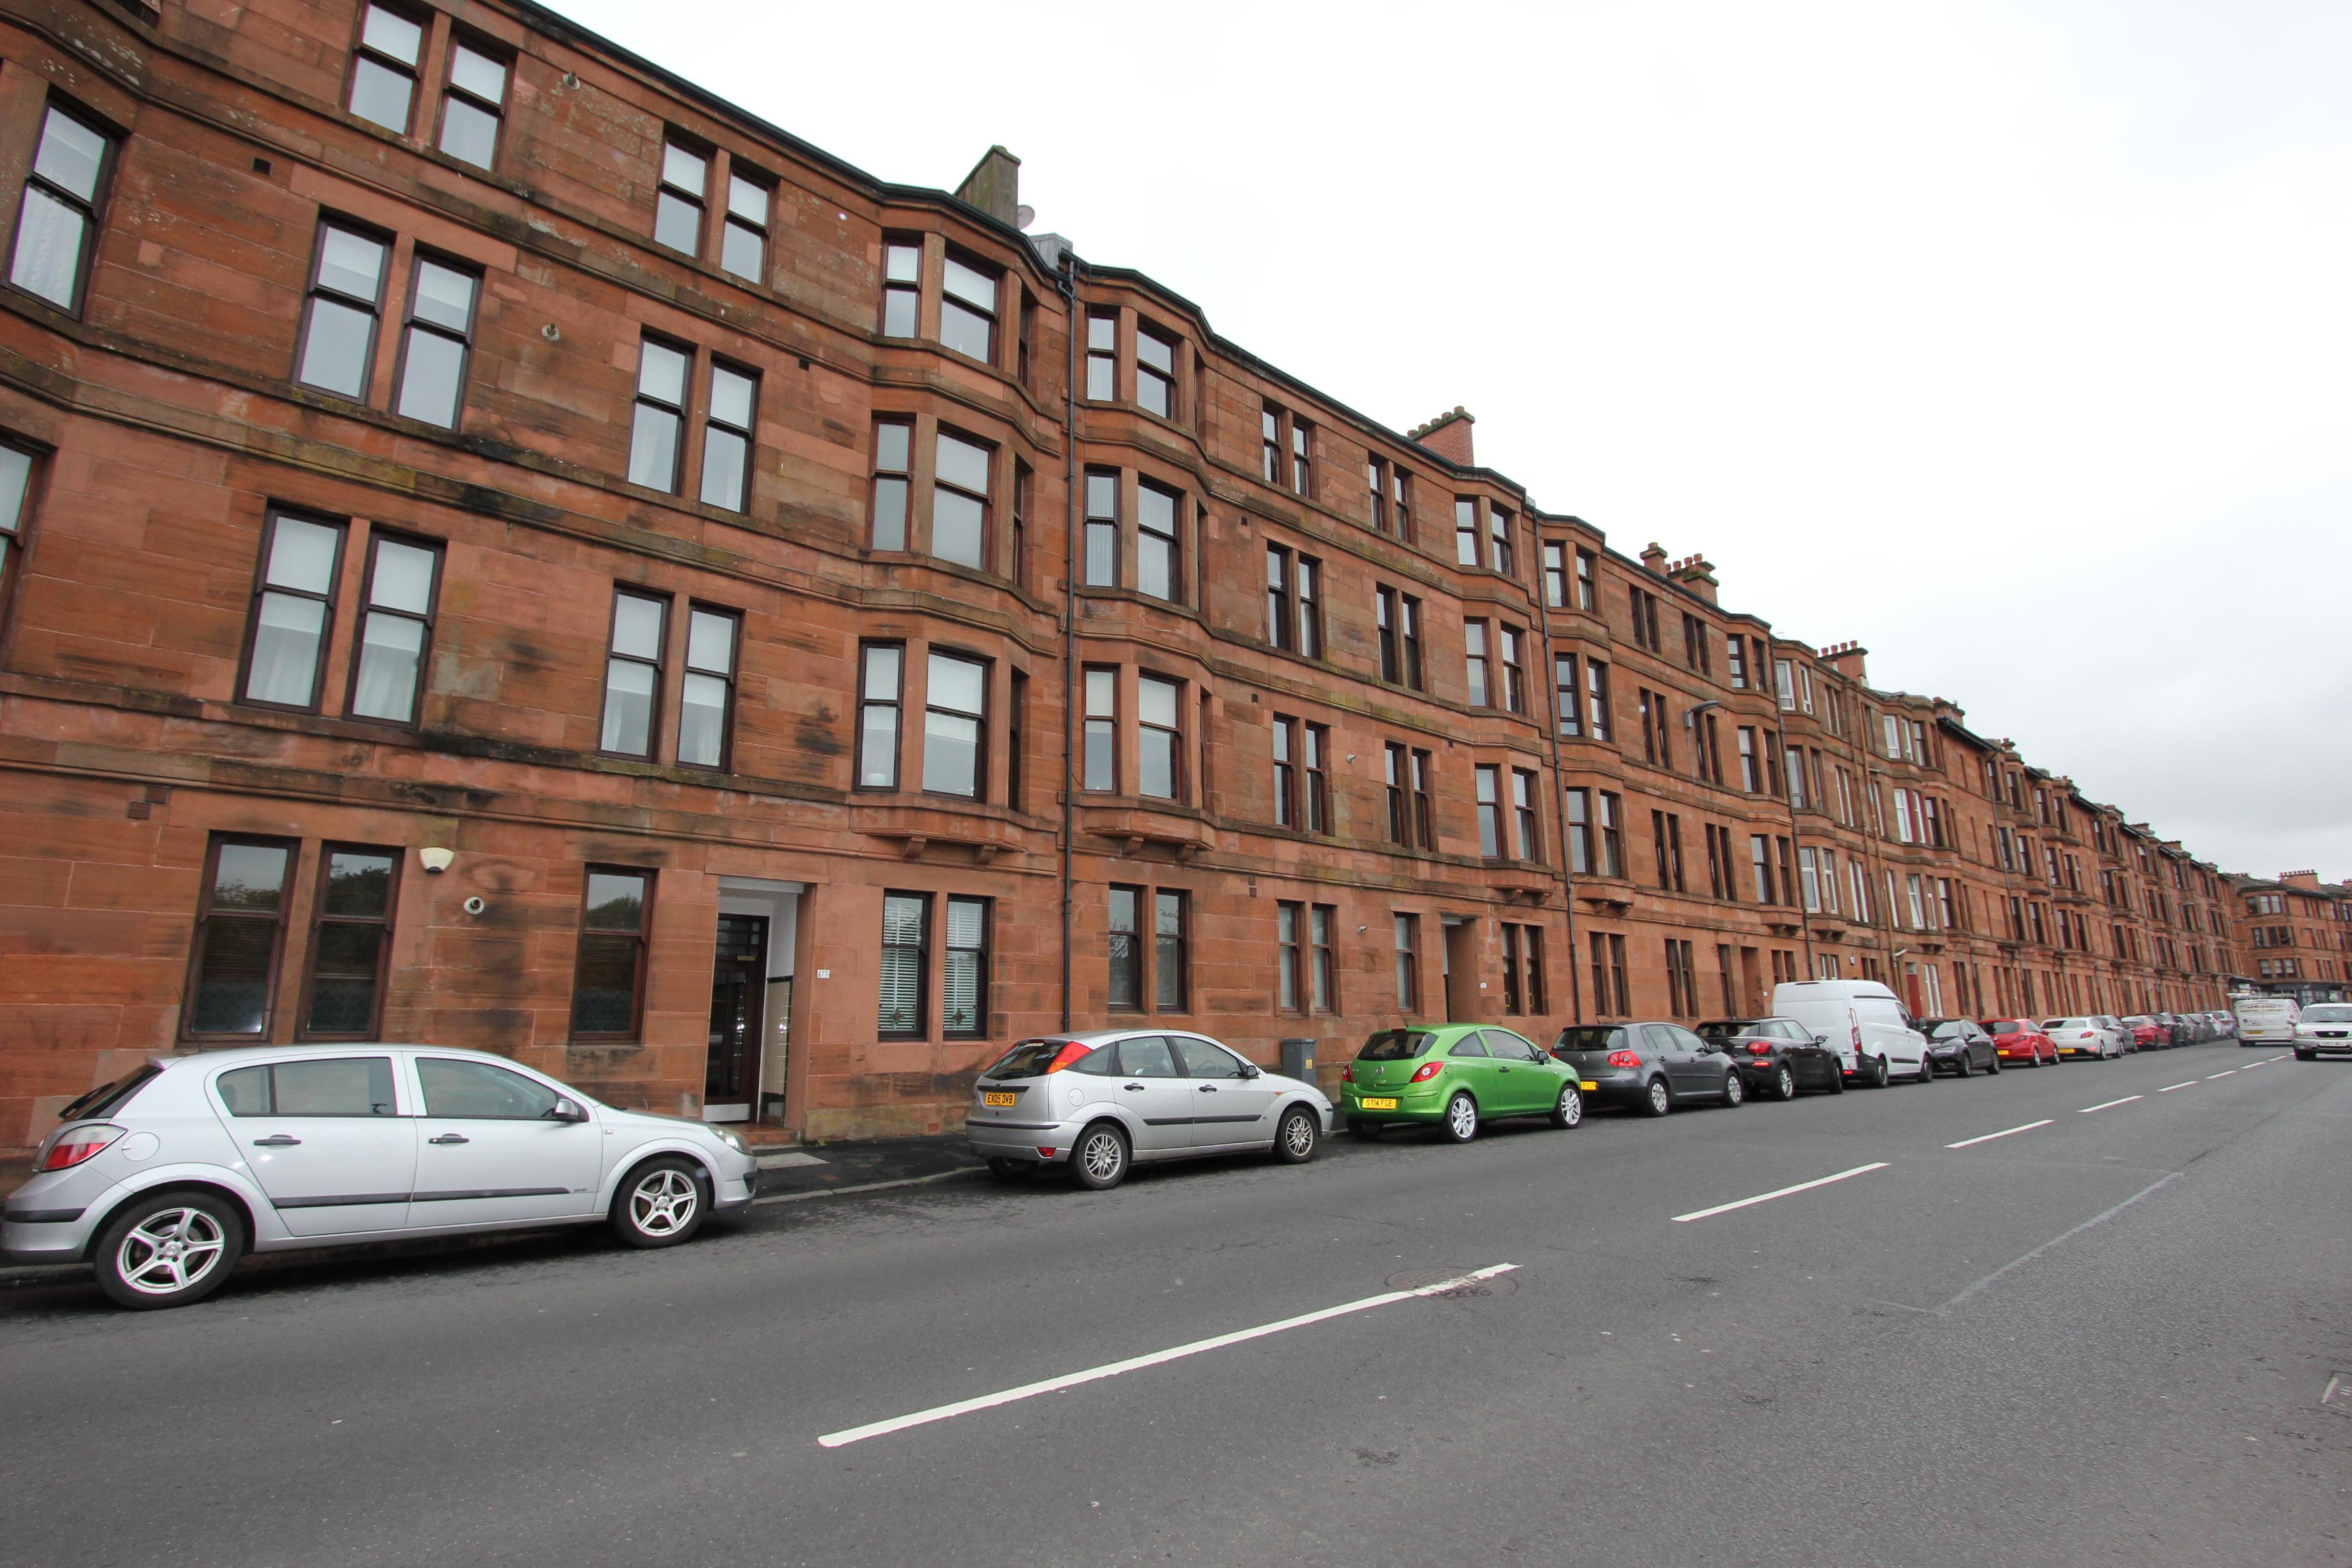 185 Holmlea Road Flat 0-2 Glasgow G44 4AA – Available Now